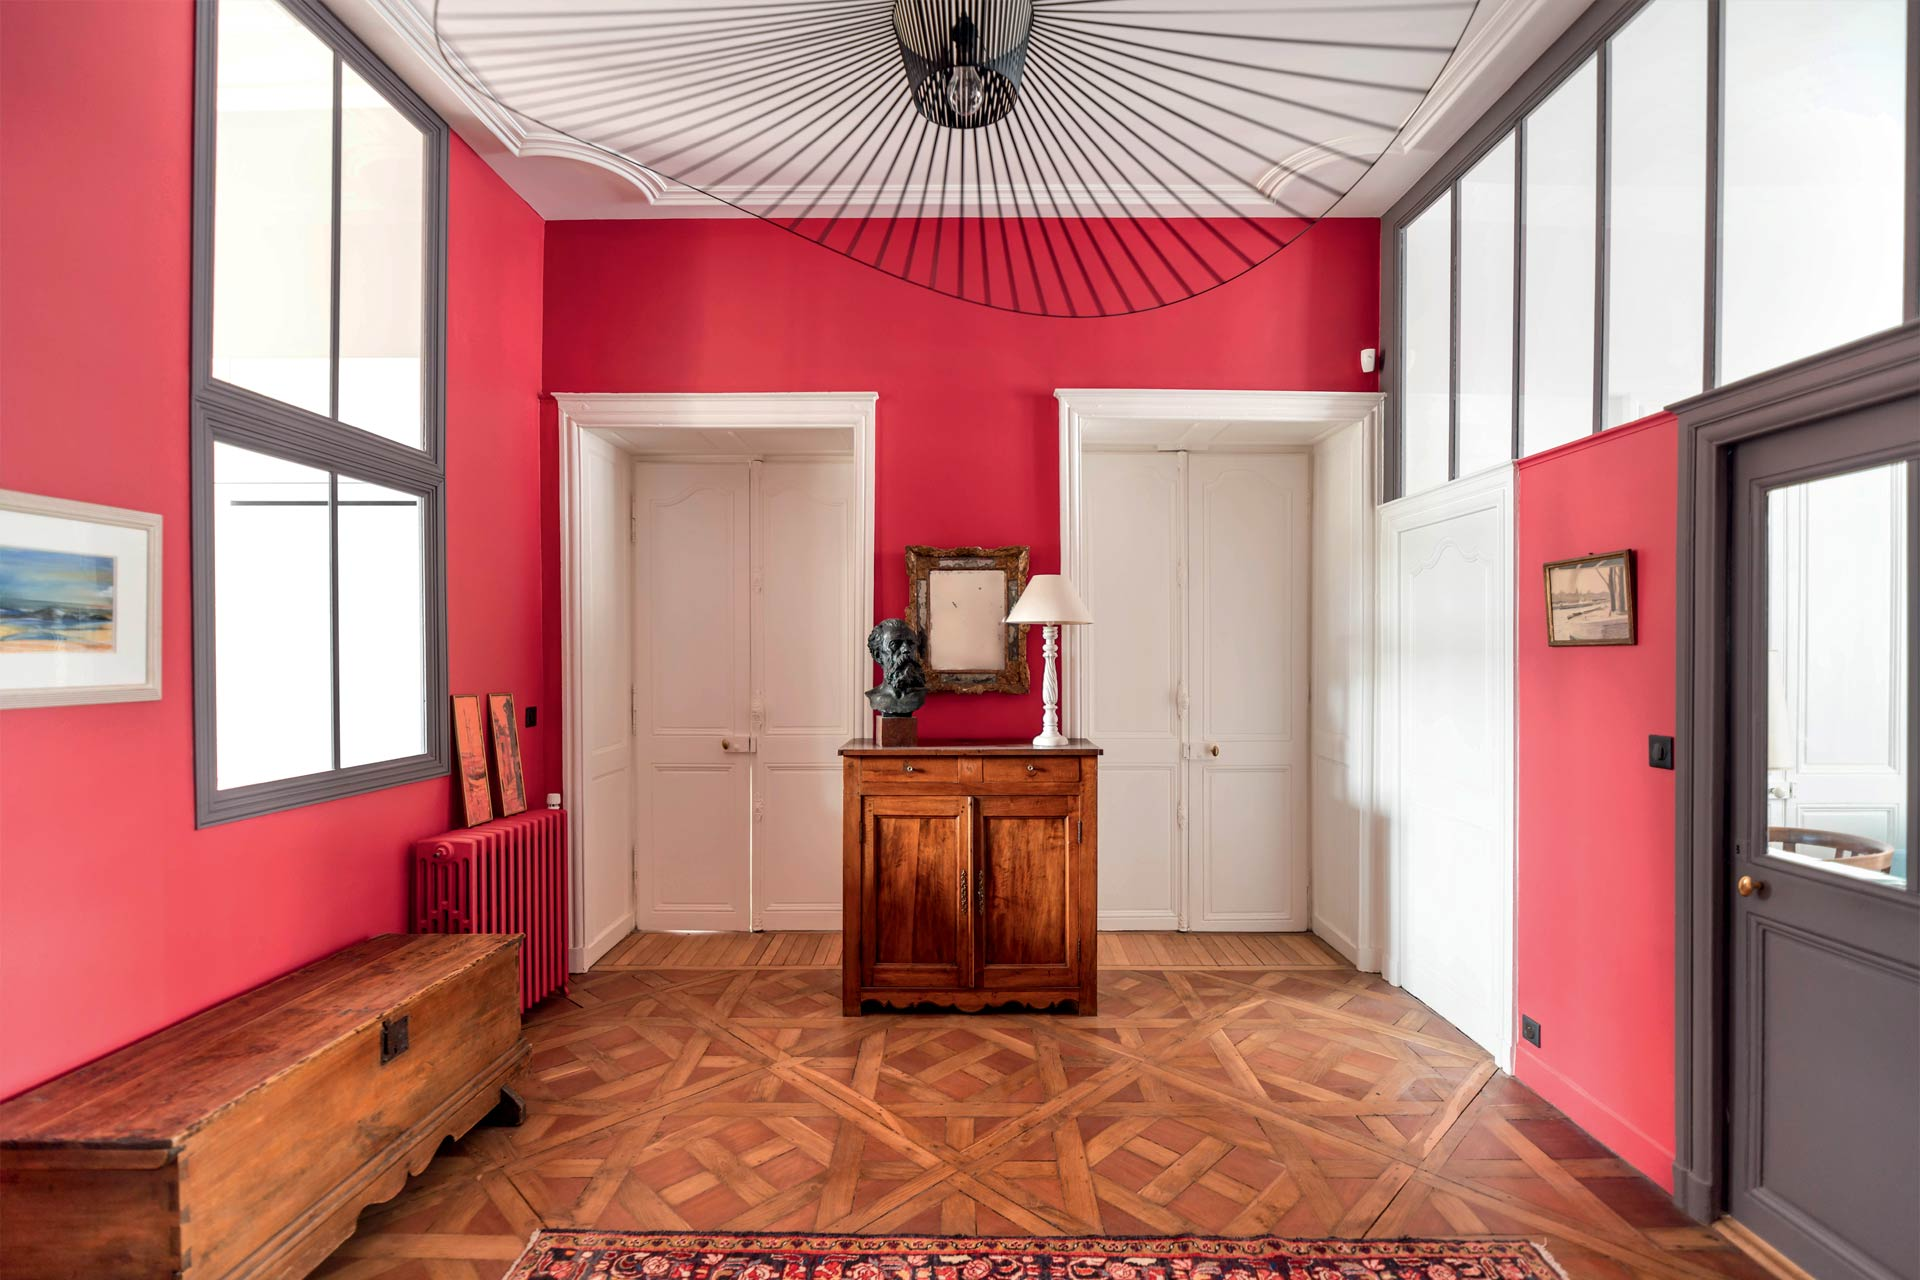 Entrée meublée grande friture - Nantes 44 - © Germain Durand